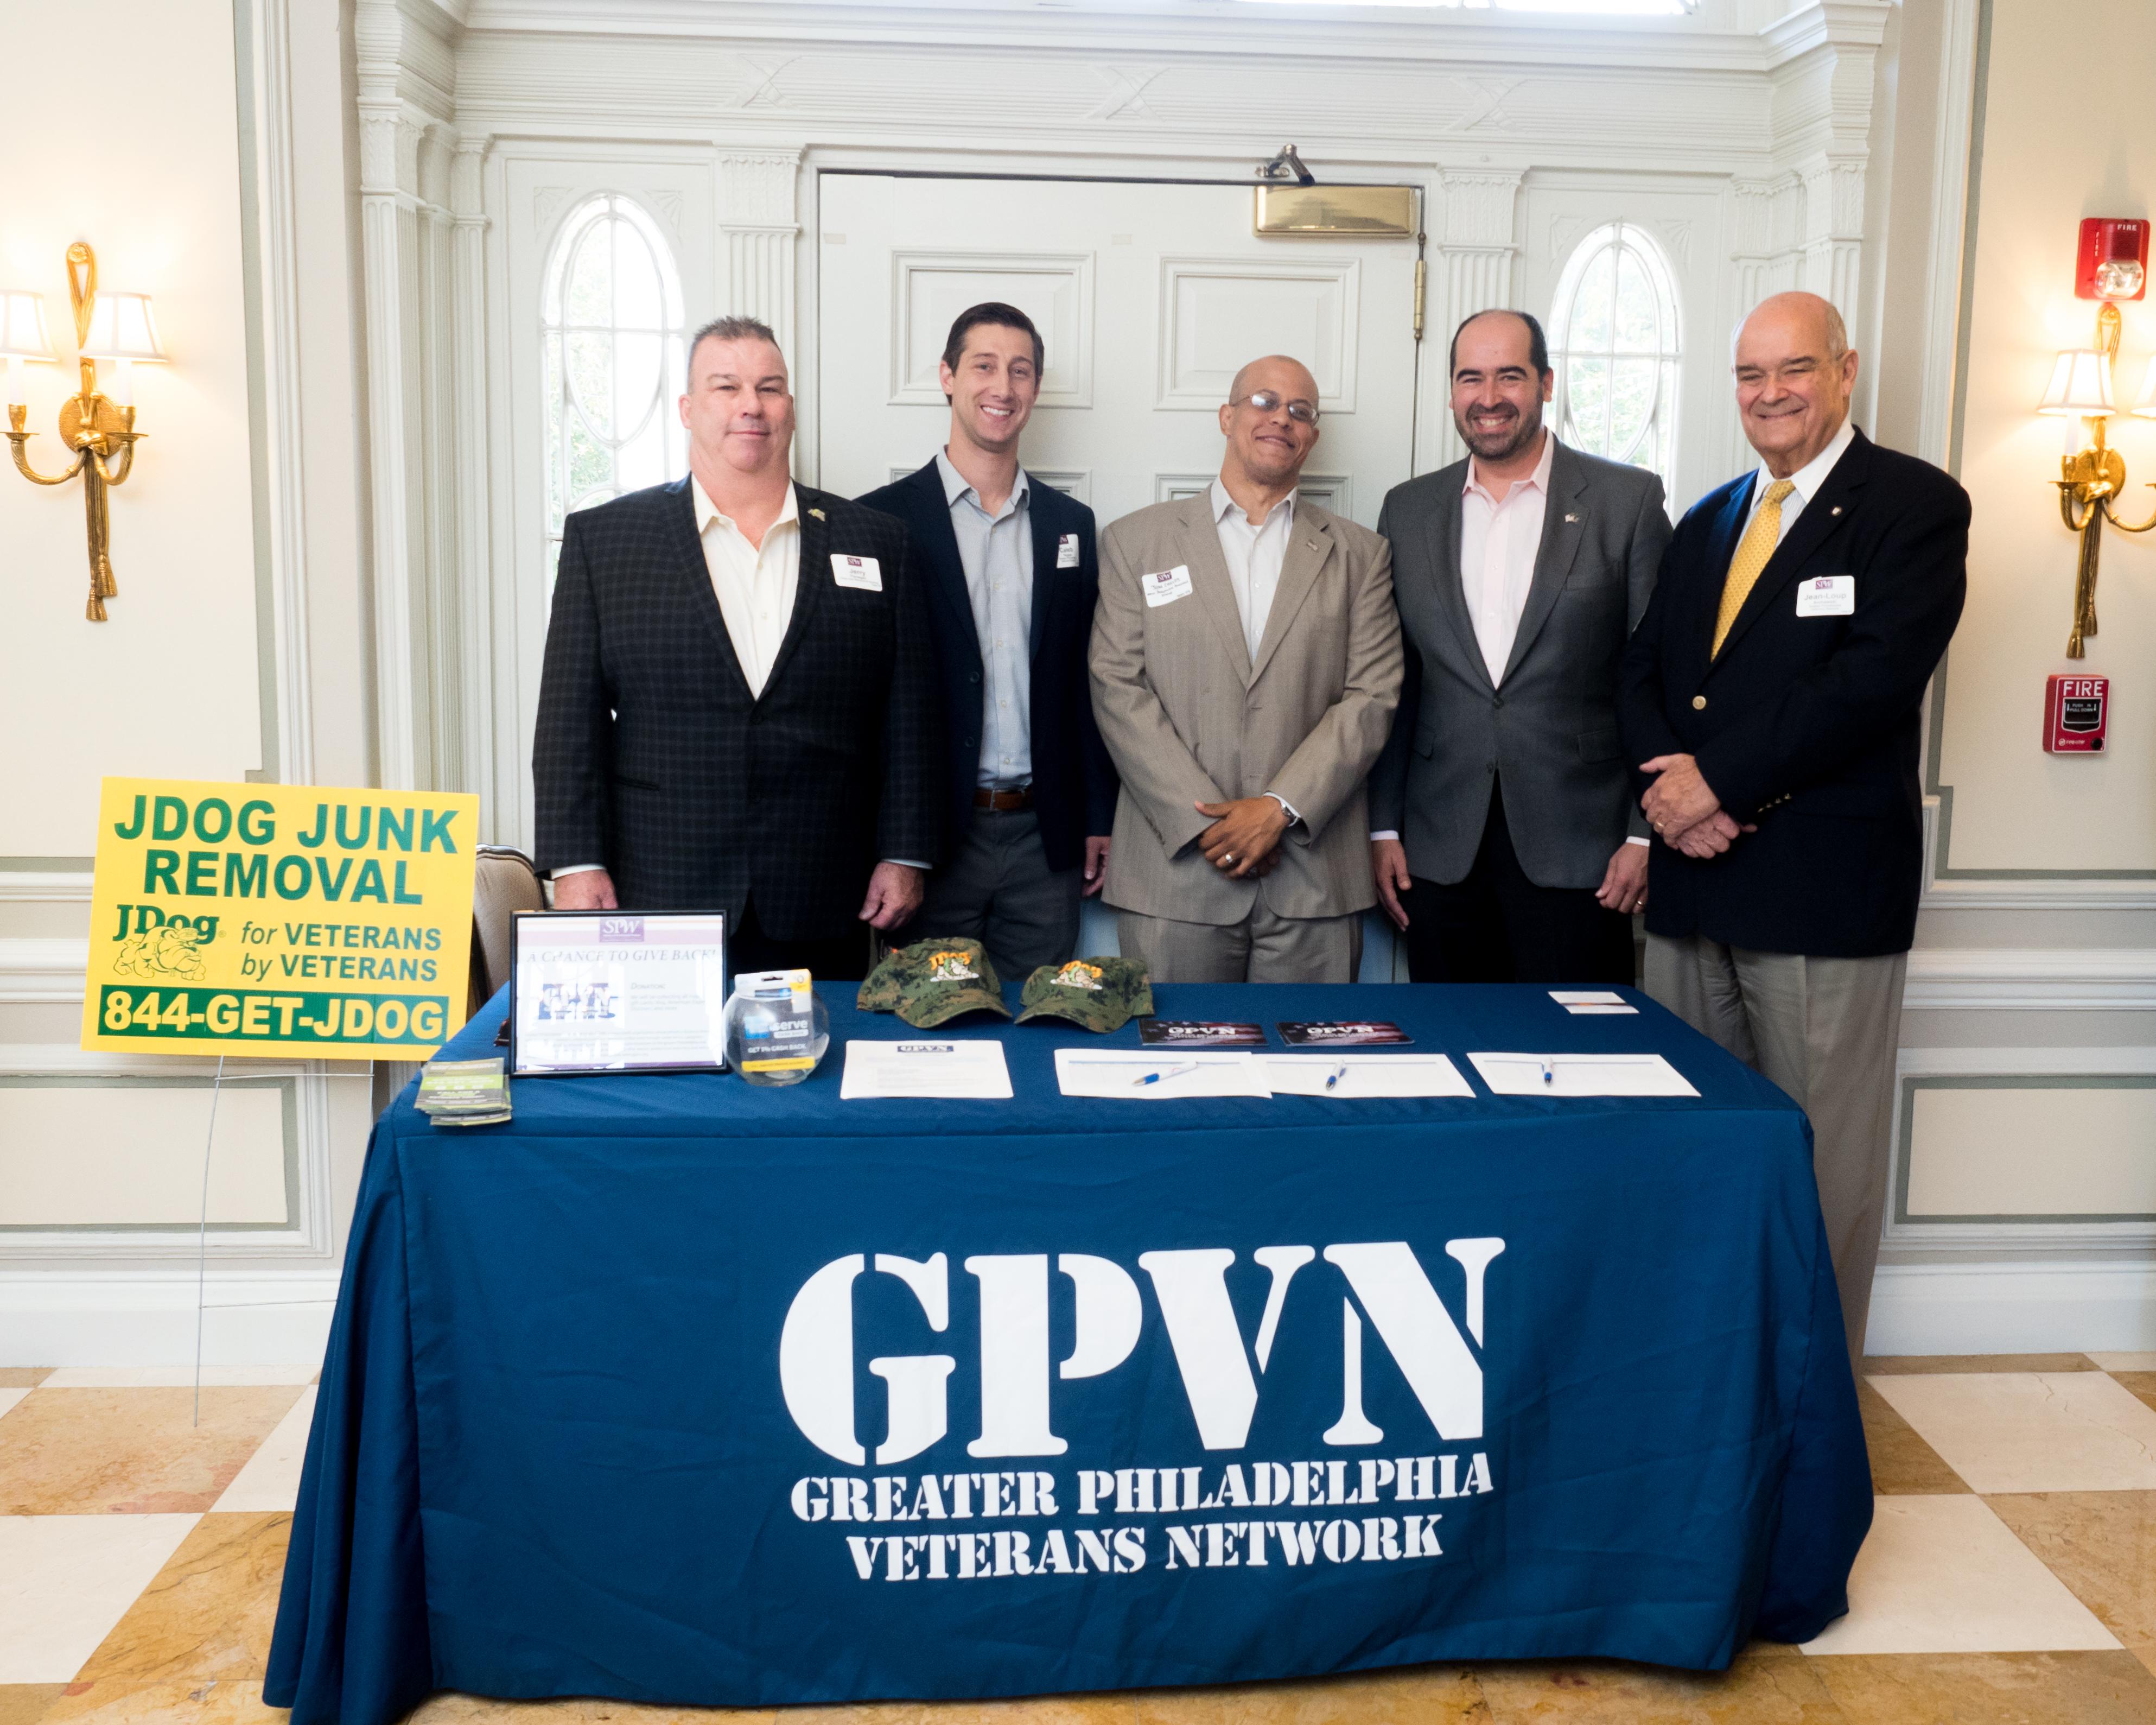 Featured Non-Profit GPVN